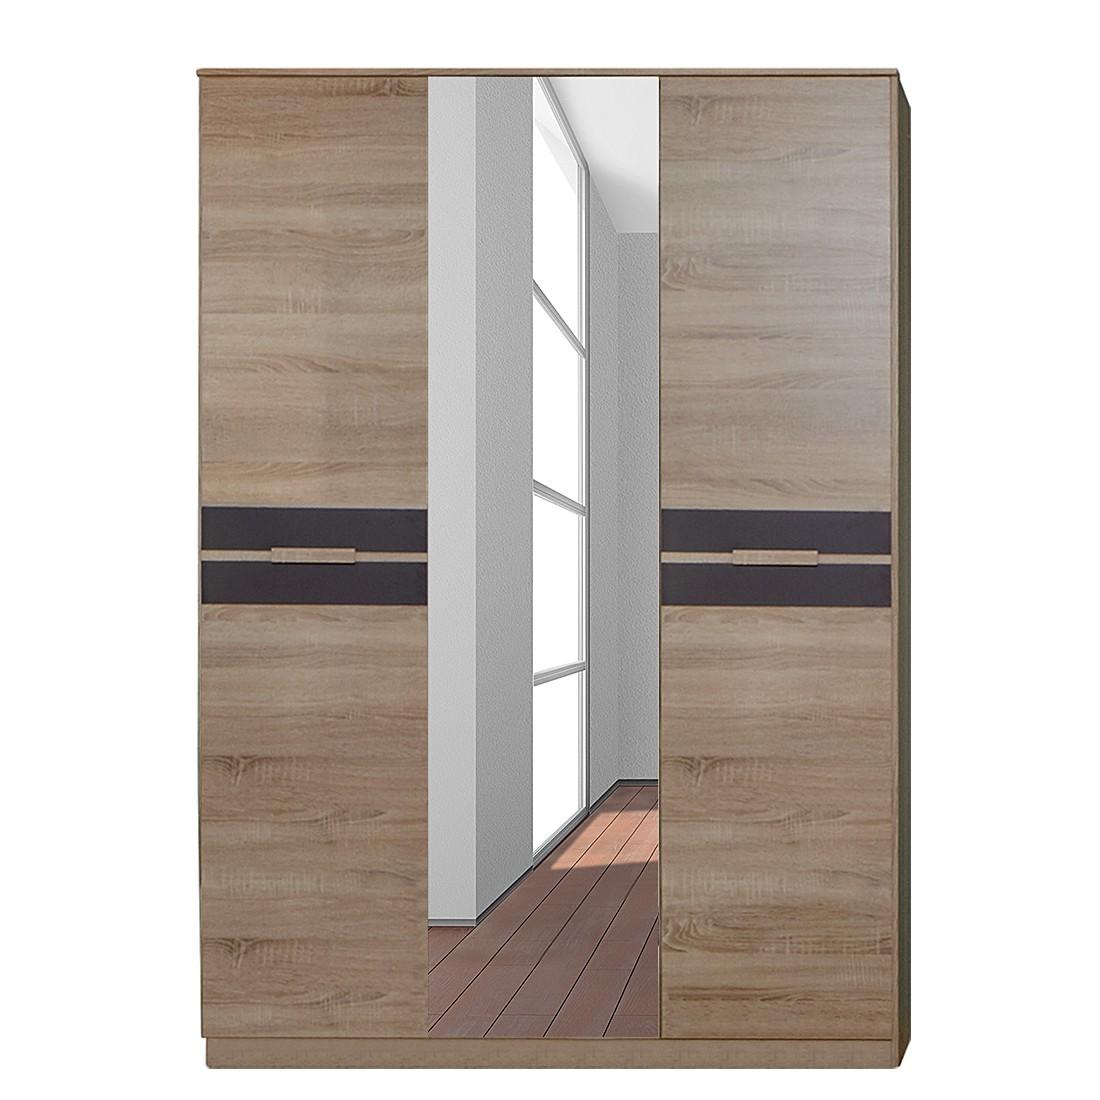 Kledingkast Fame (3-deurs) - grof gezaagde eikenhouten look/lavasteenkleurig, Wimex